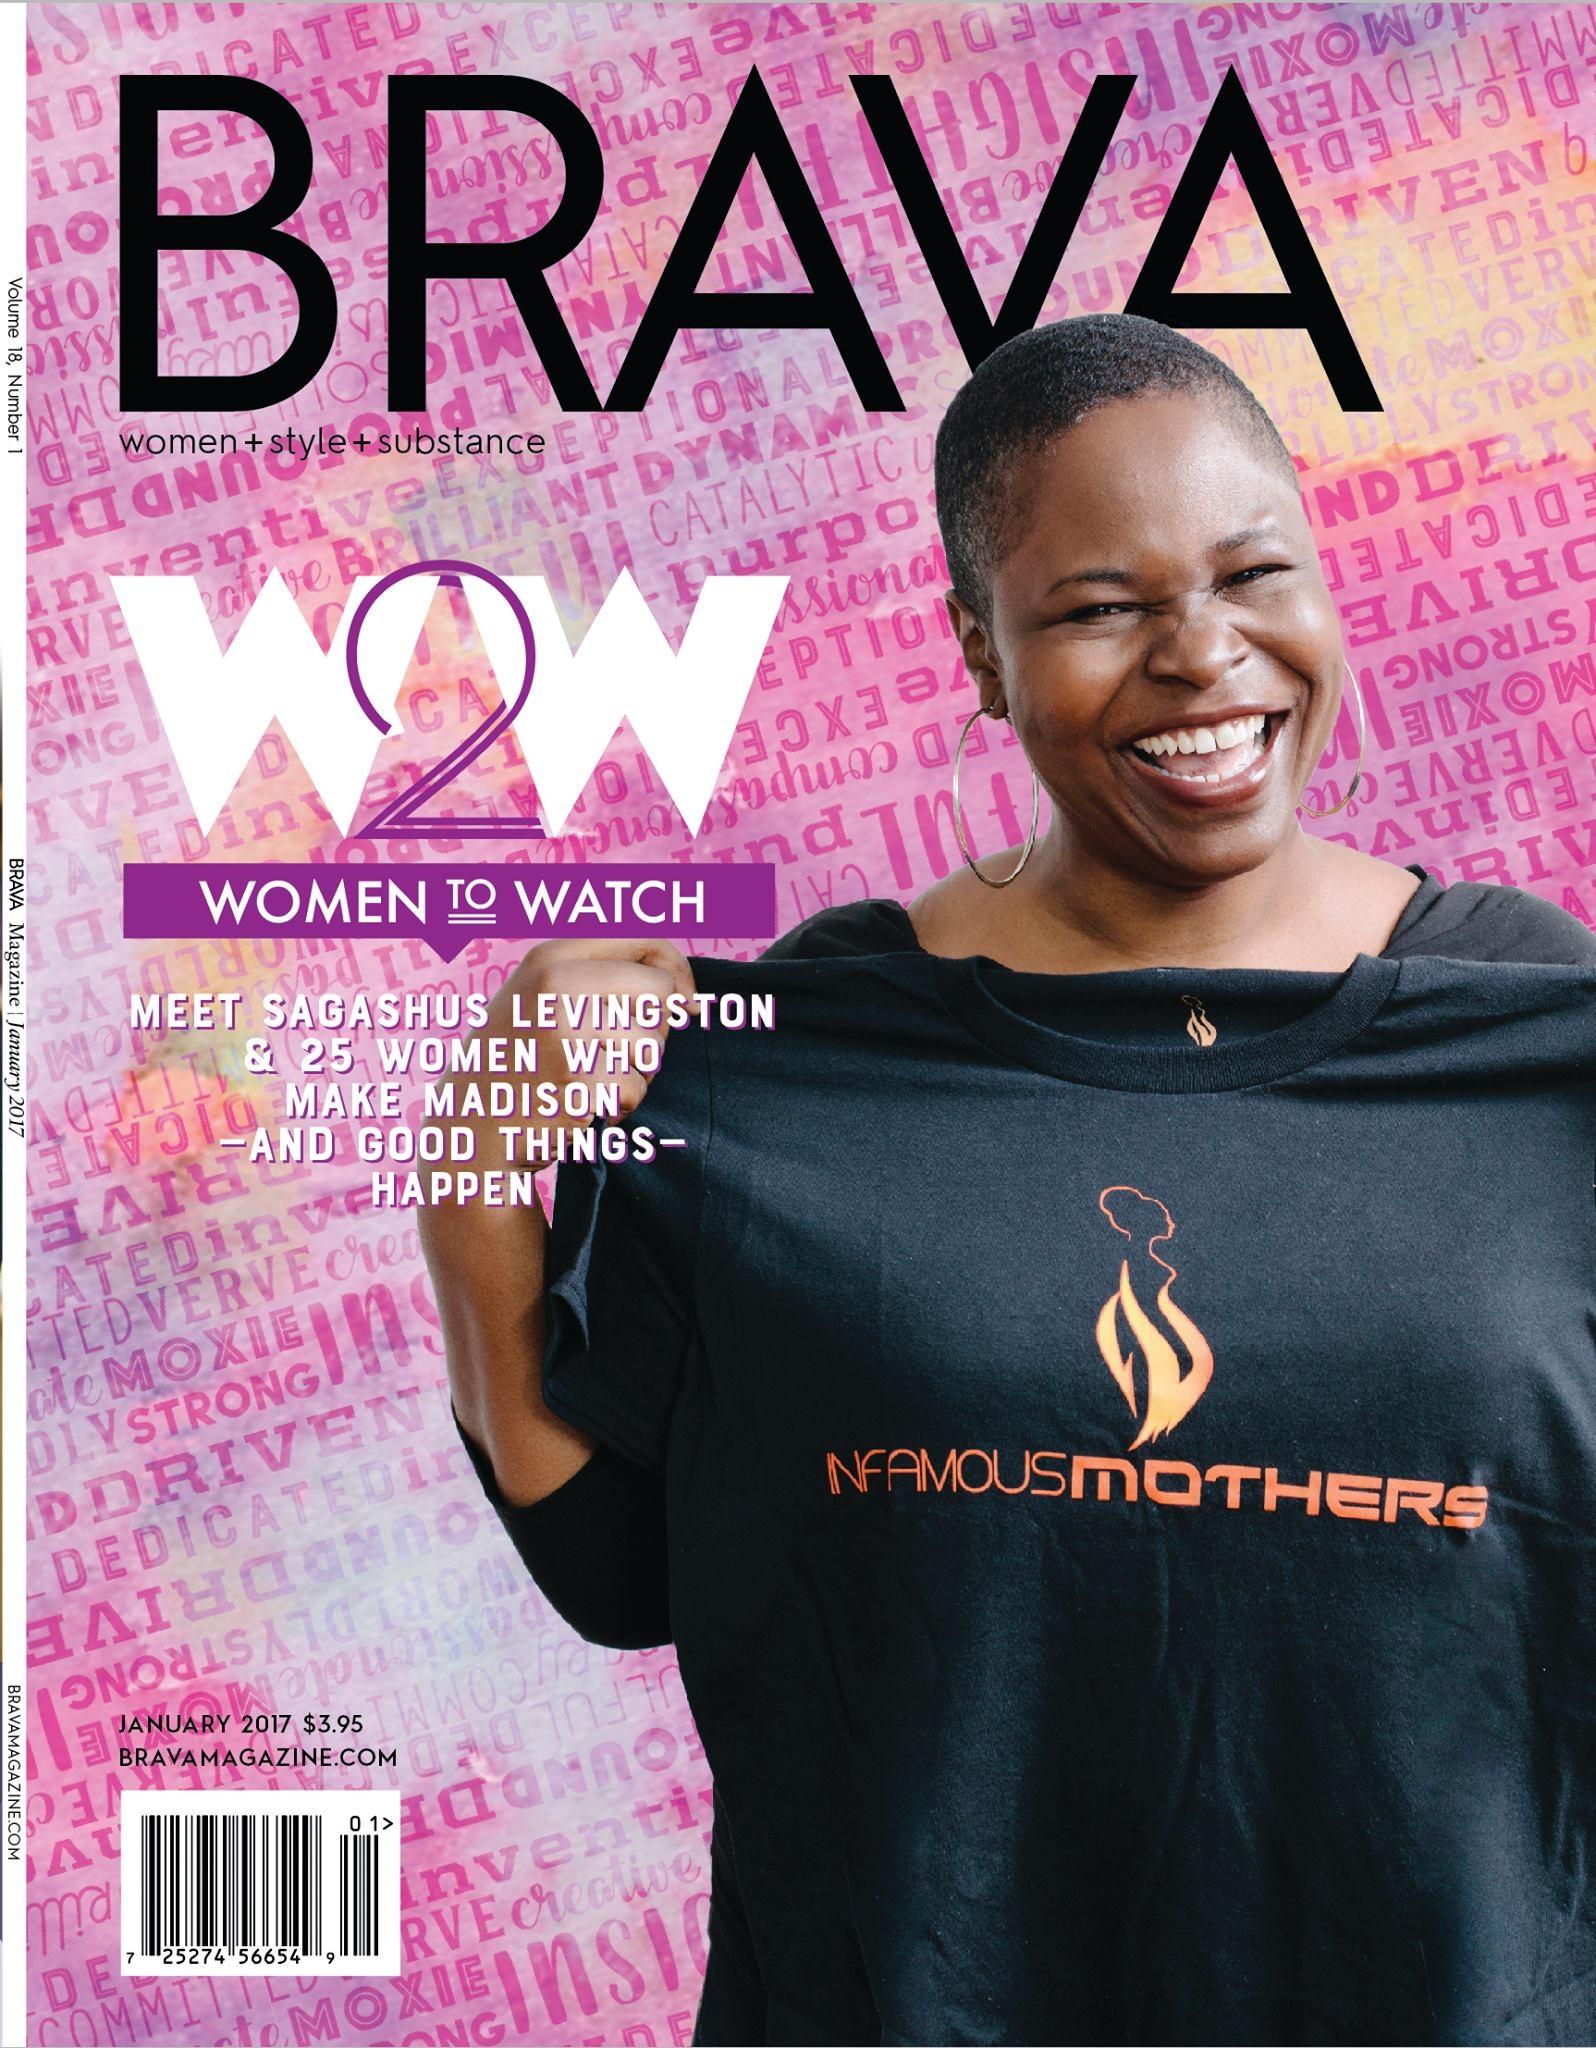 BRAVA Magazine (Cover Girl, January 2017)